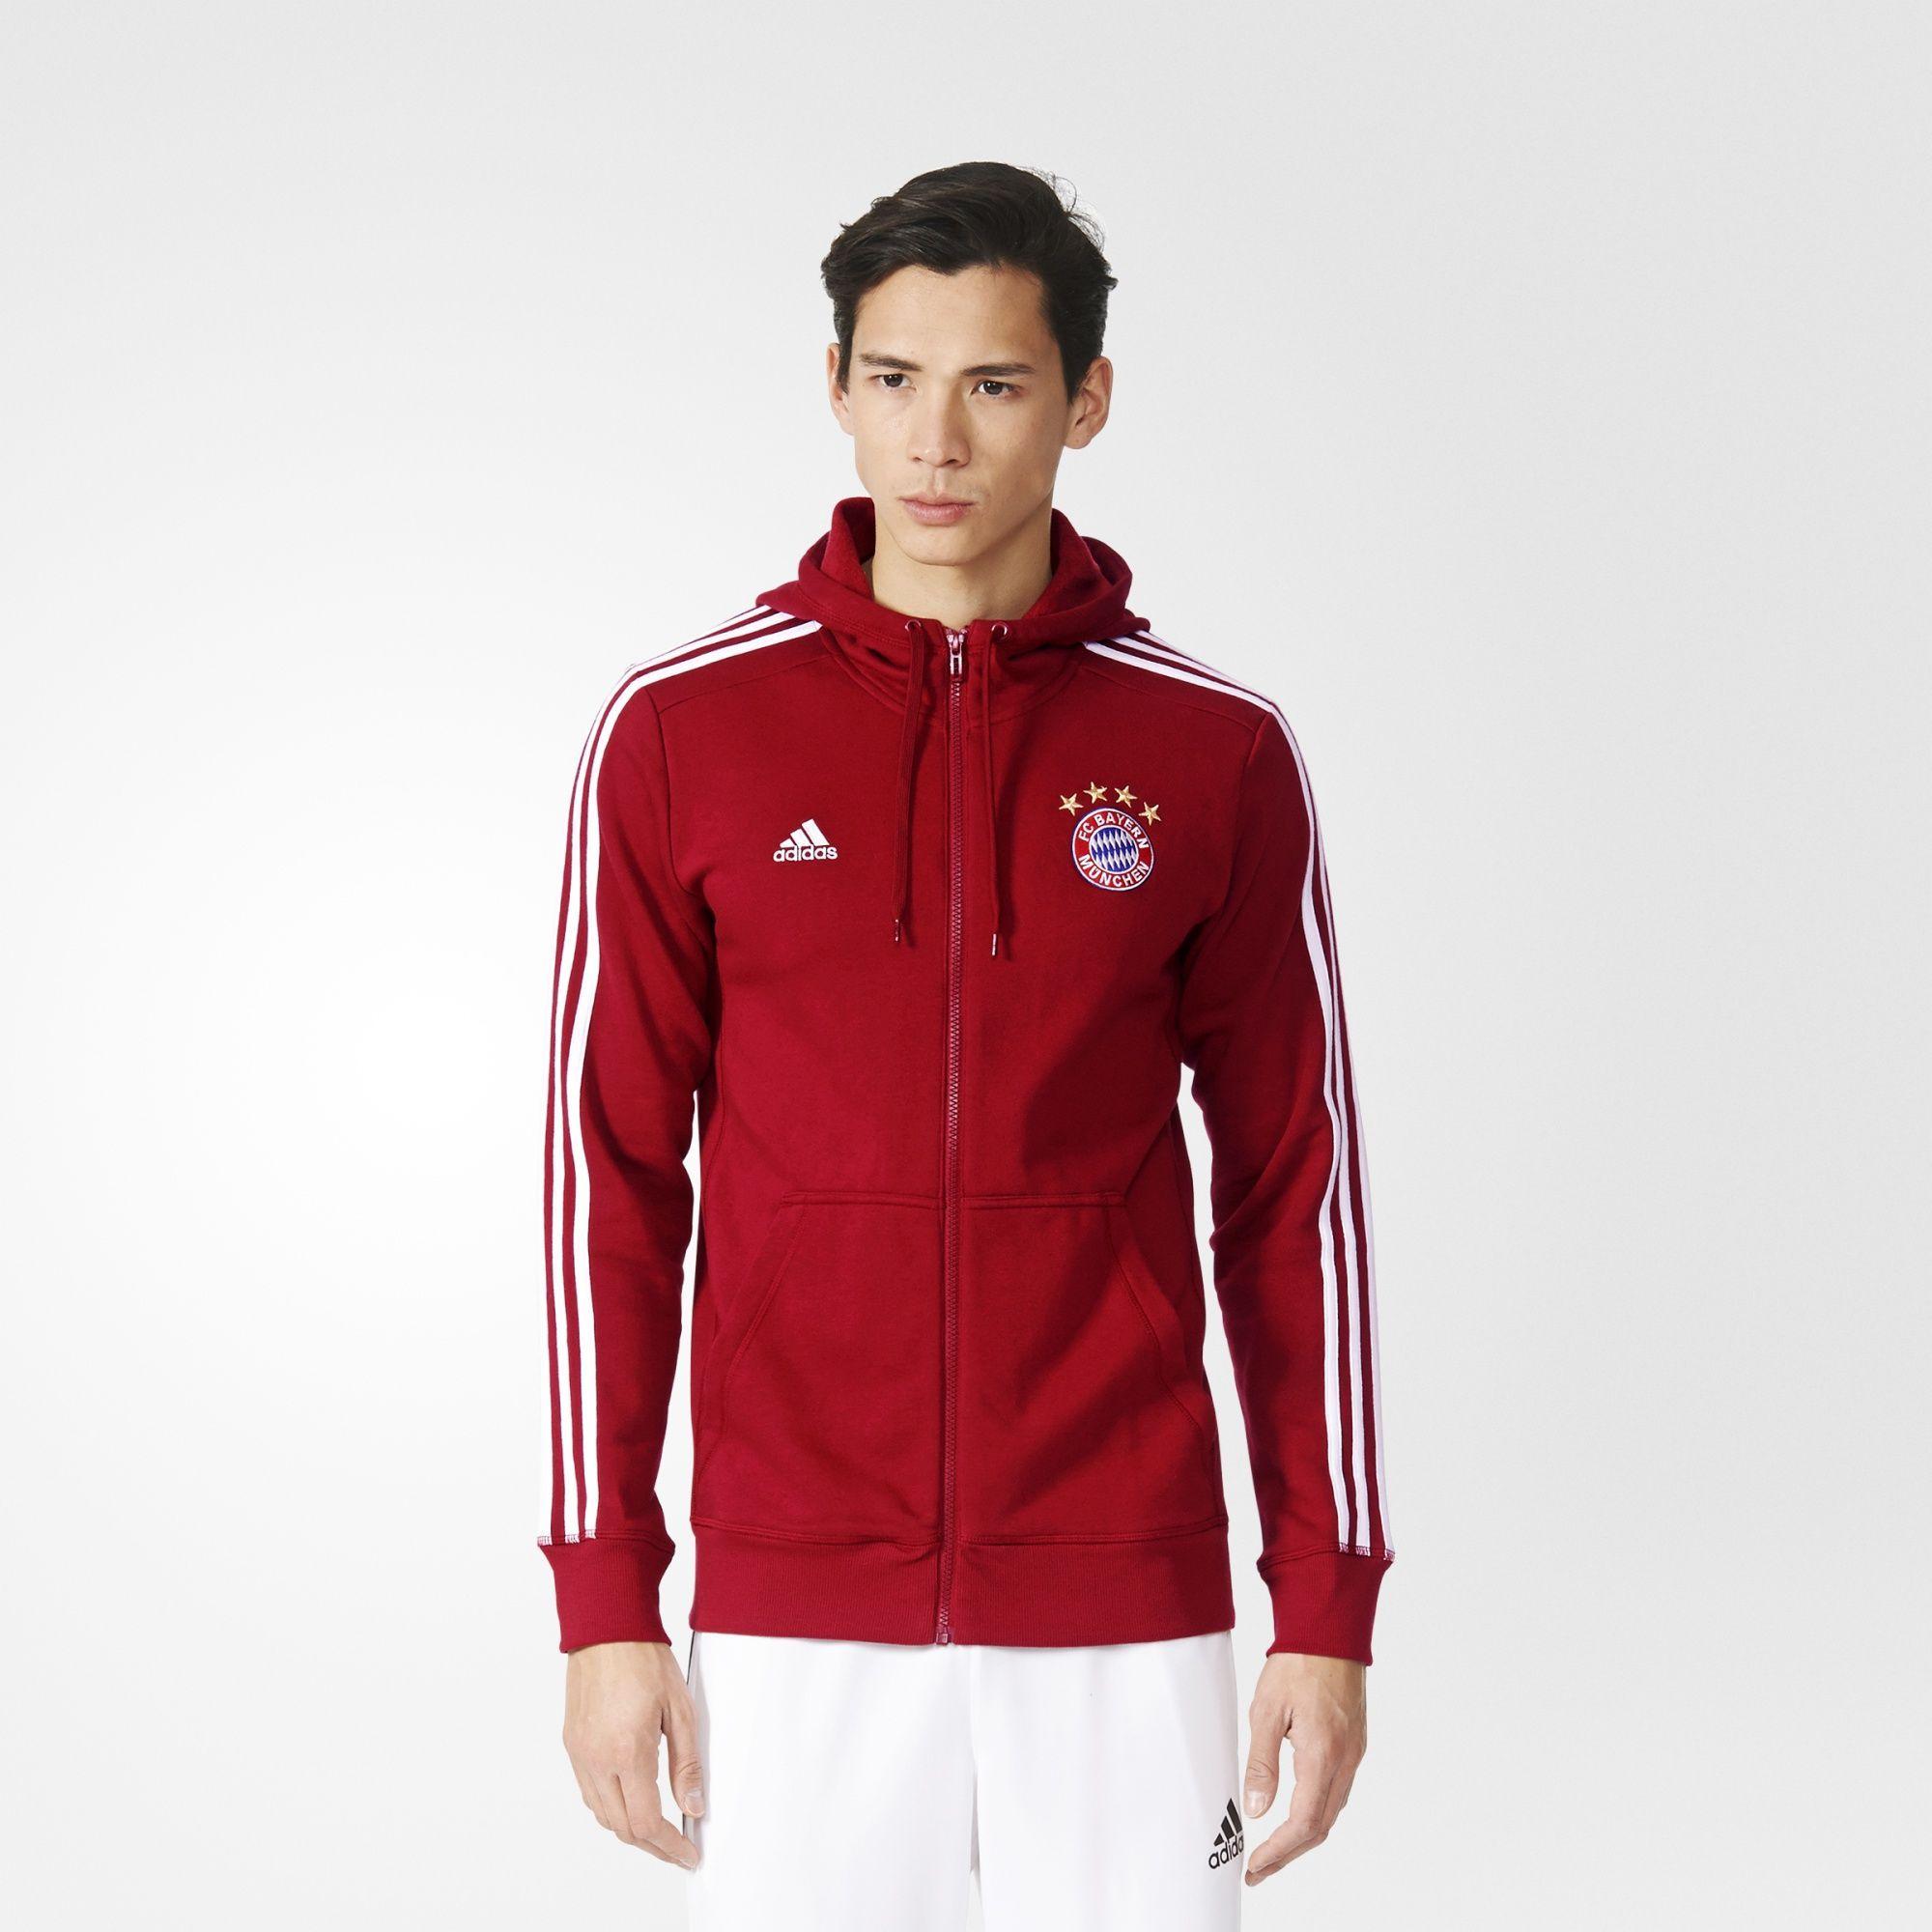 adidas Chaqueta FC Bayern Chaqueta FC con capucha 15720 | 9b02c62 - accademiadellescienzedellumbria.xyz